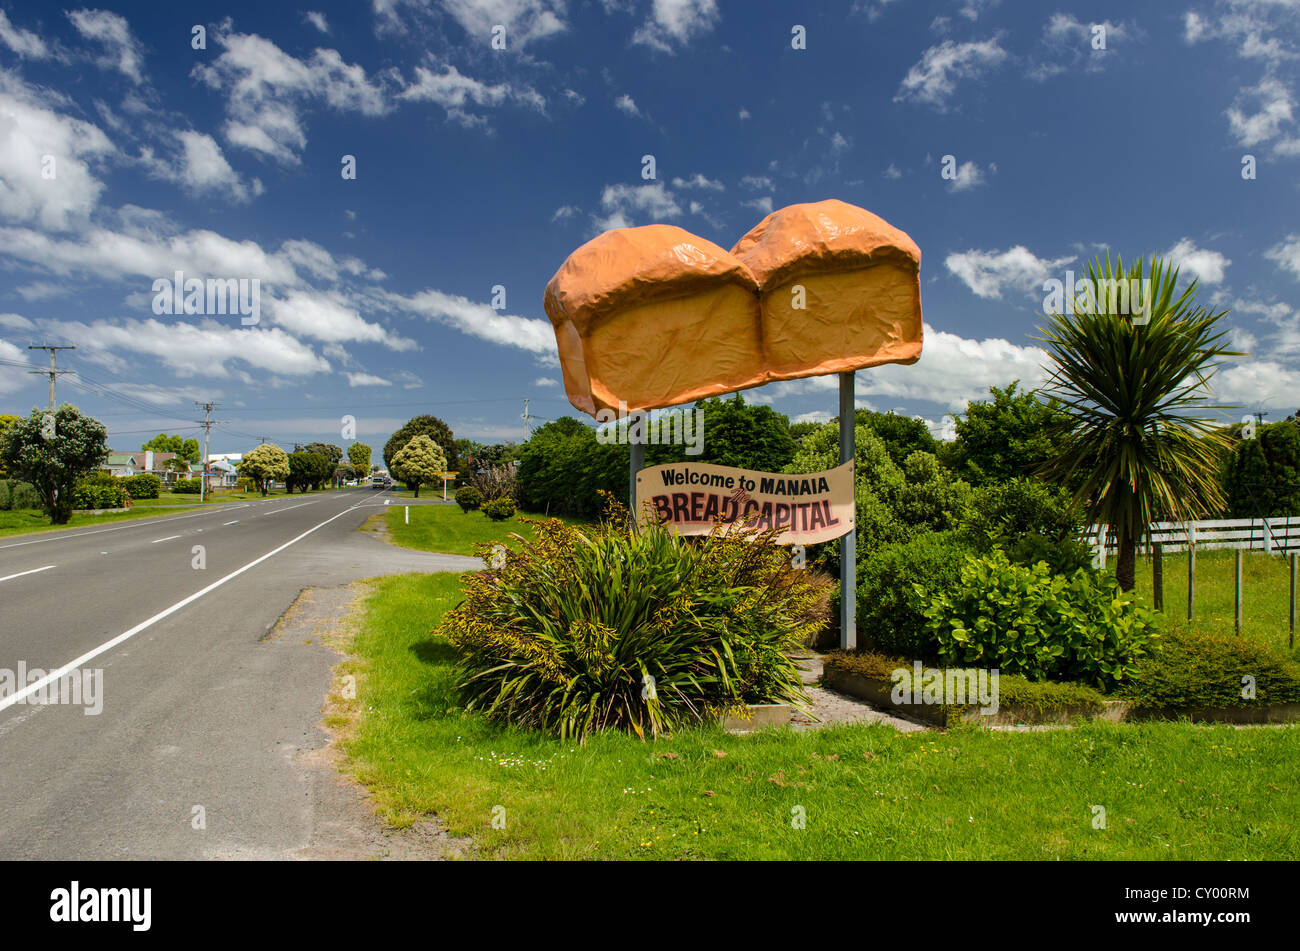 White bread sculpture, Bread Capital, Manaia, North Island, New Zealand - Stock Image